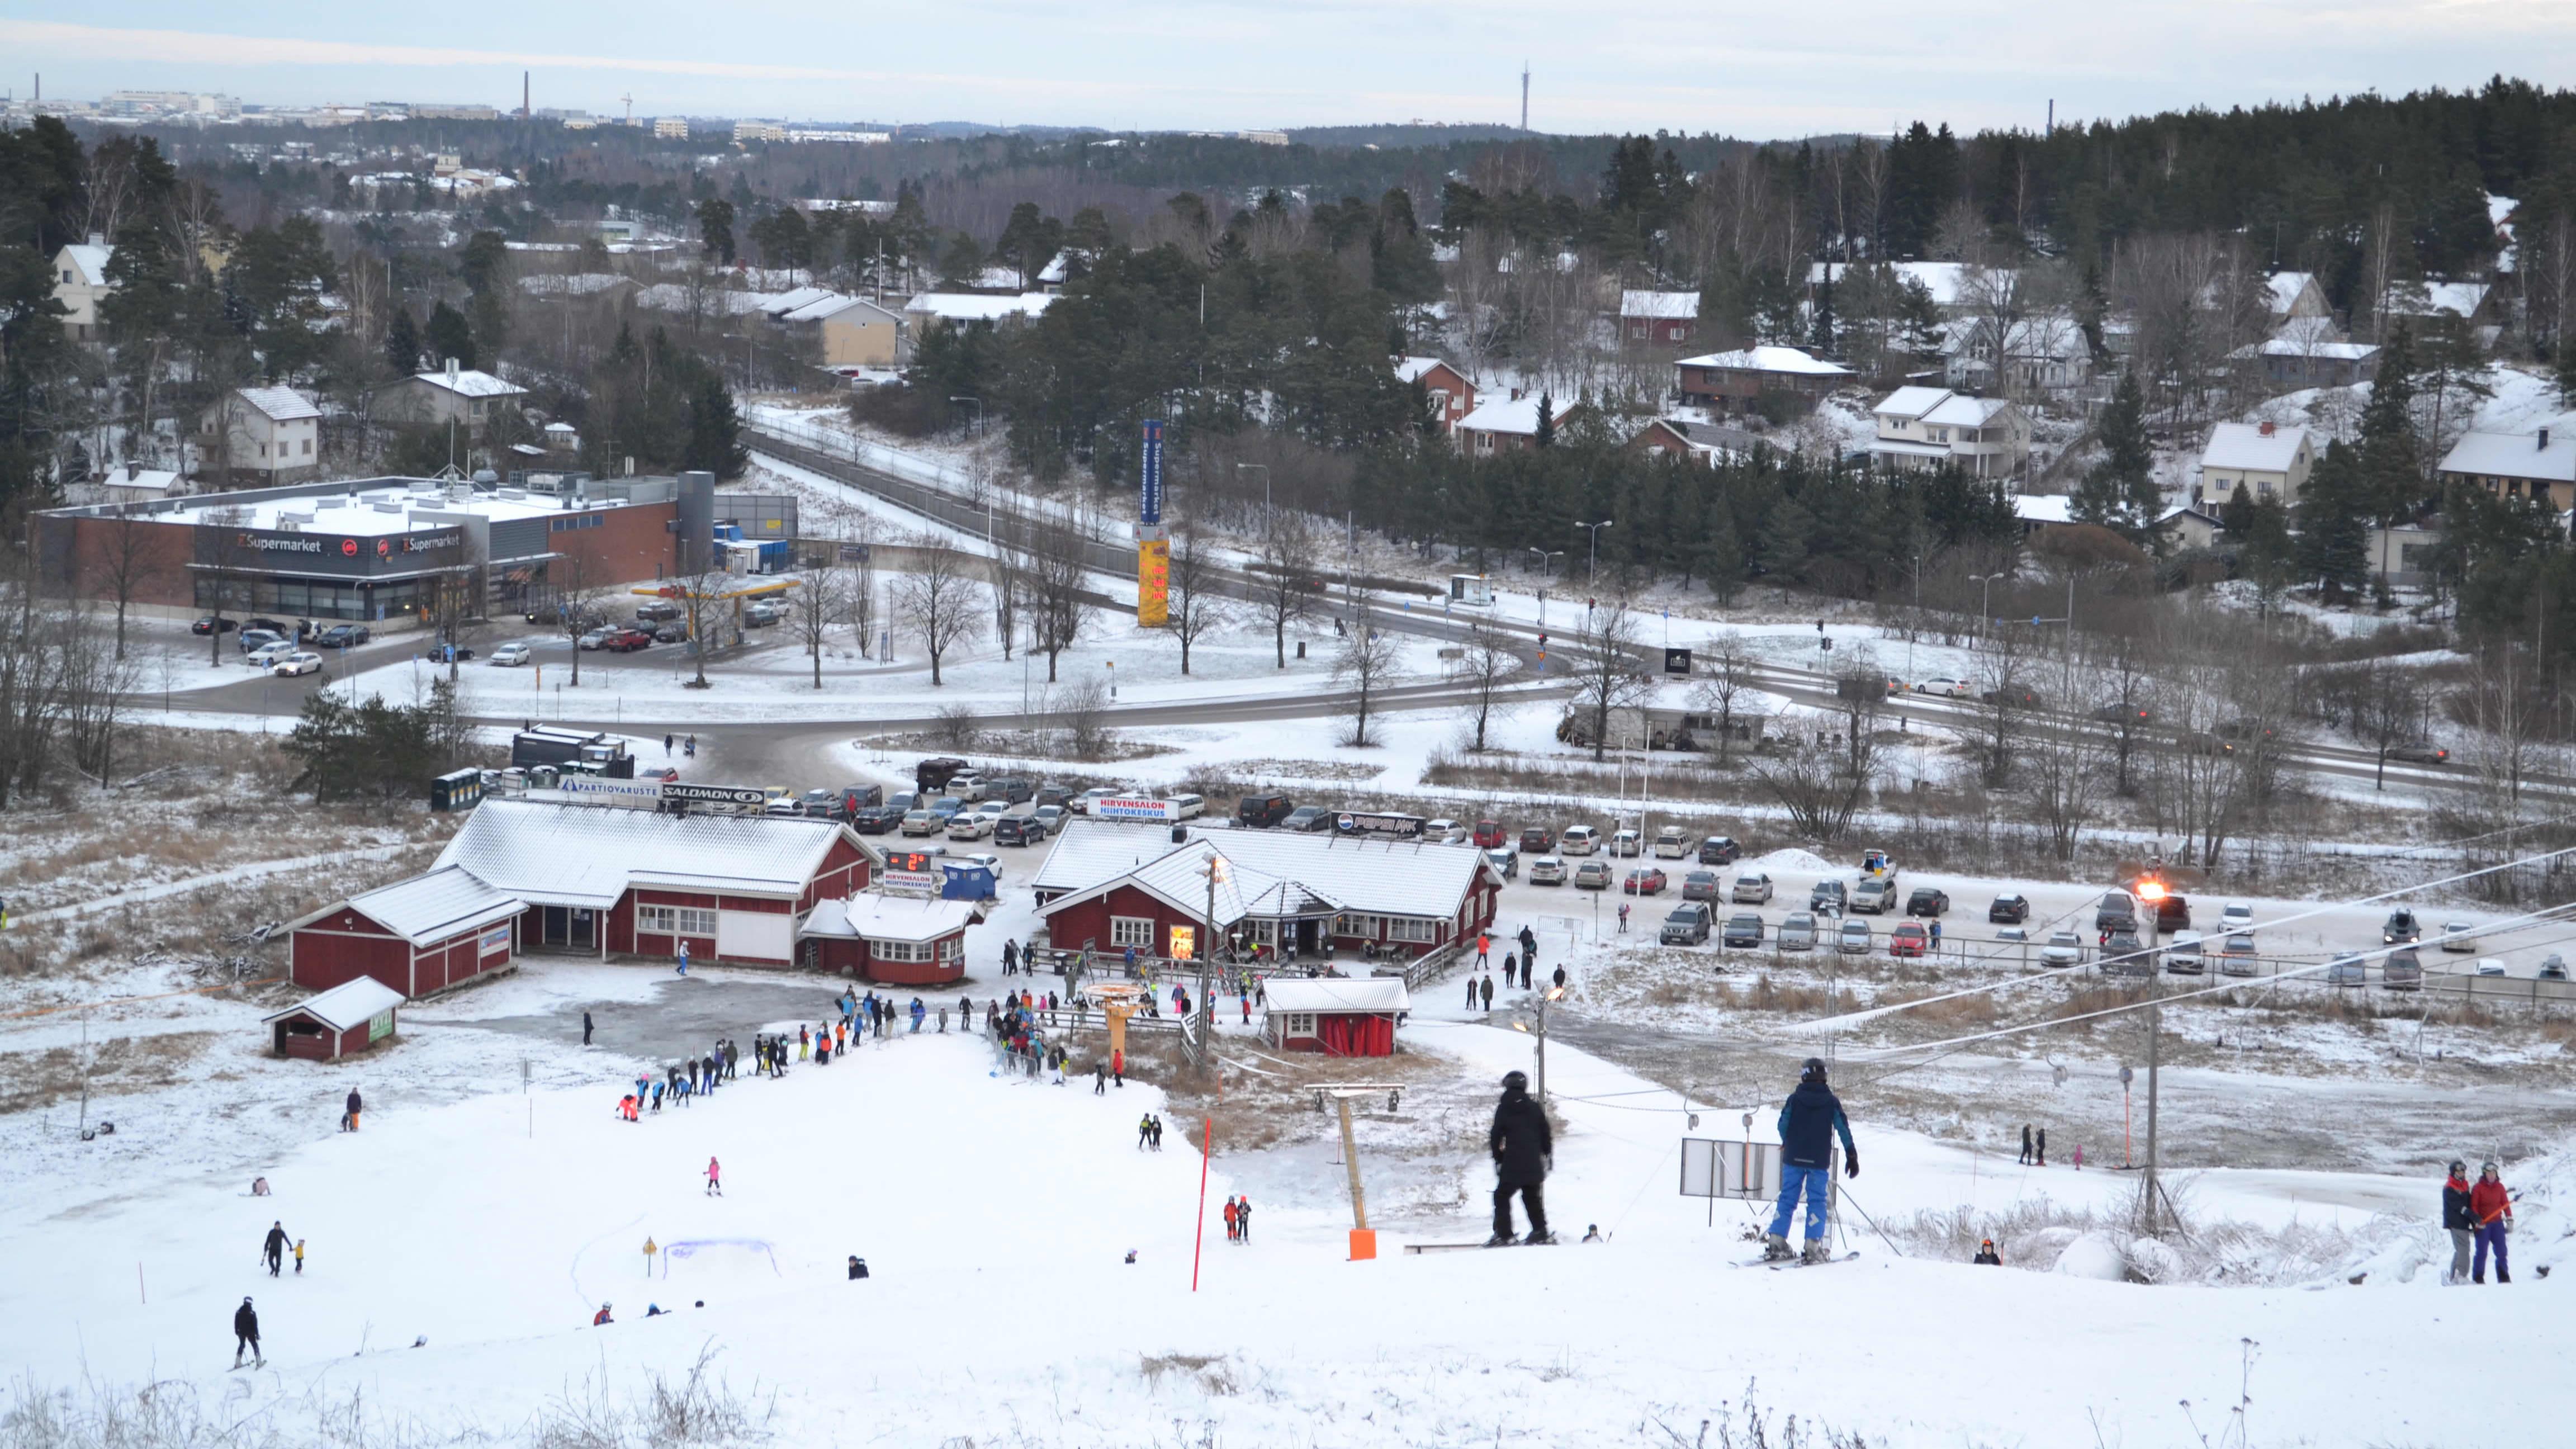 Slalomåkare i Hirvensalo skidbacke.